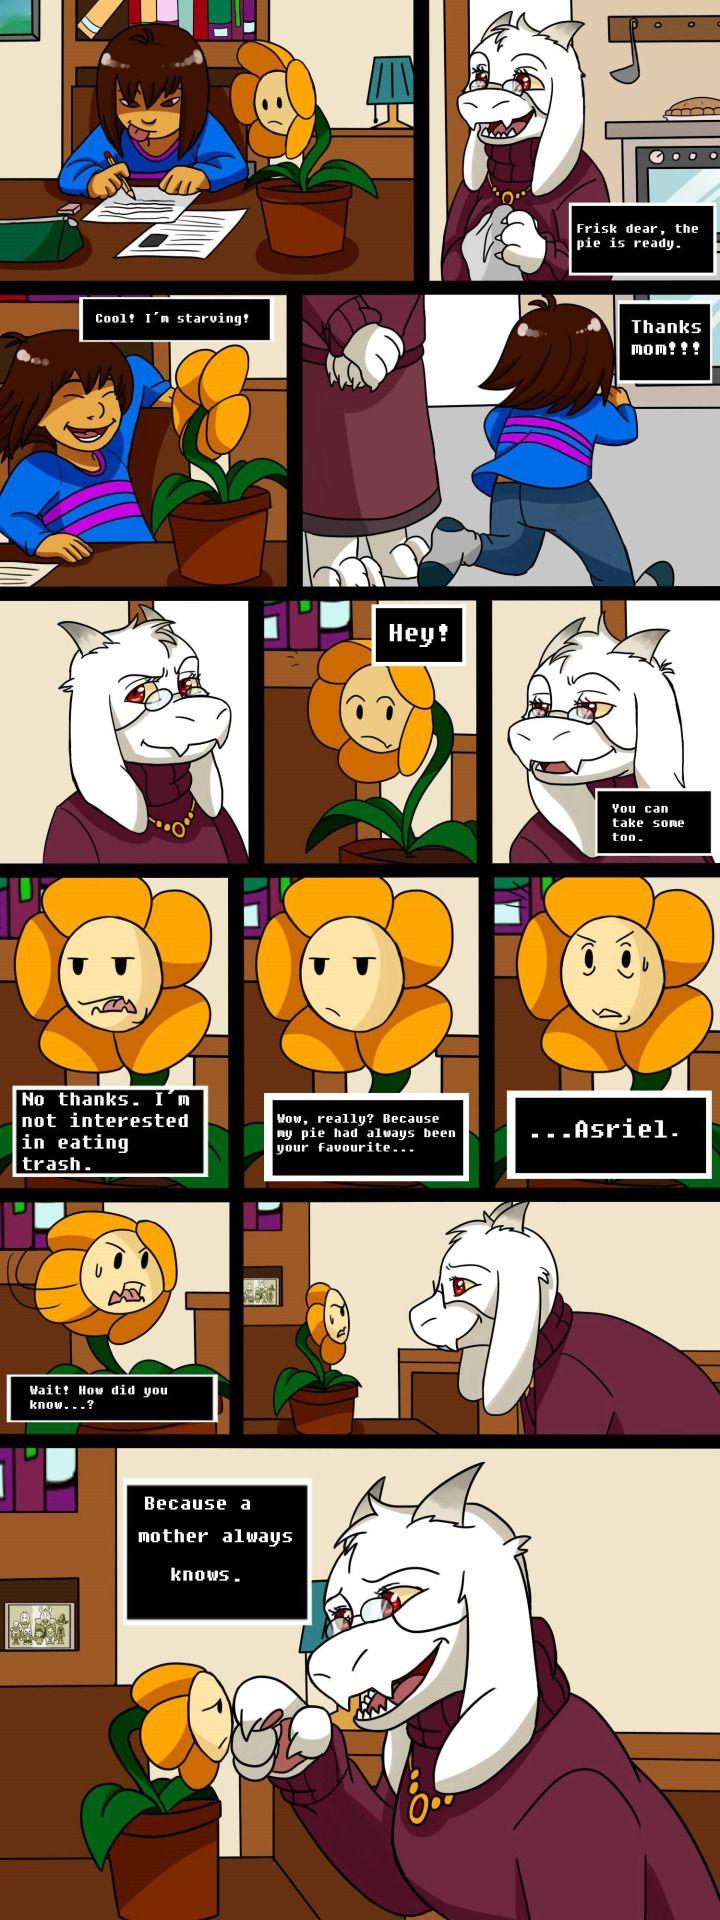 Http Kell0x Tumblr Com Undertale Funny Undertale Comic Undertale Memes